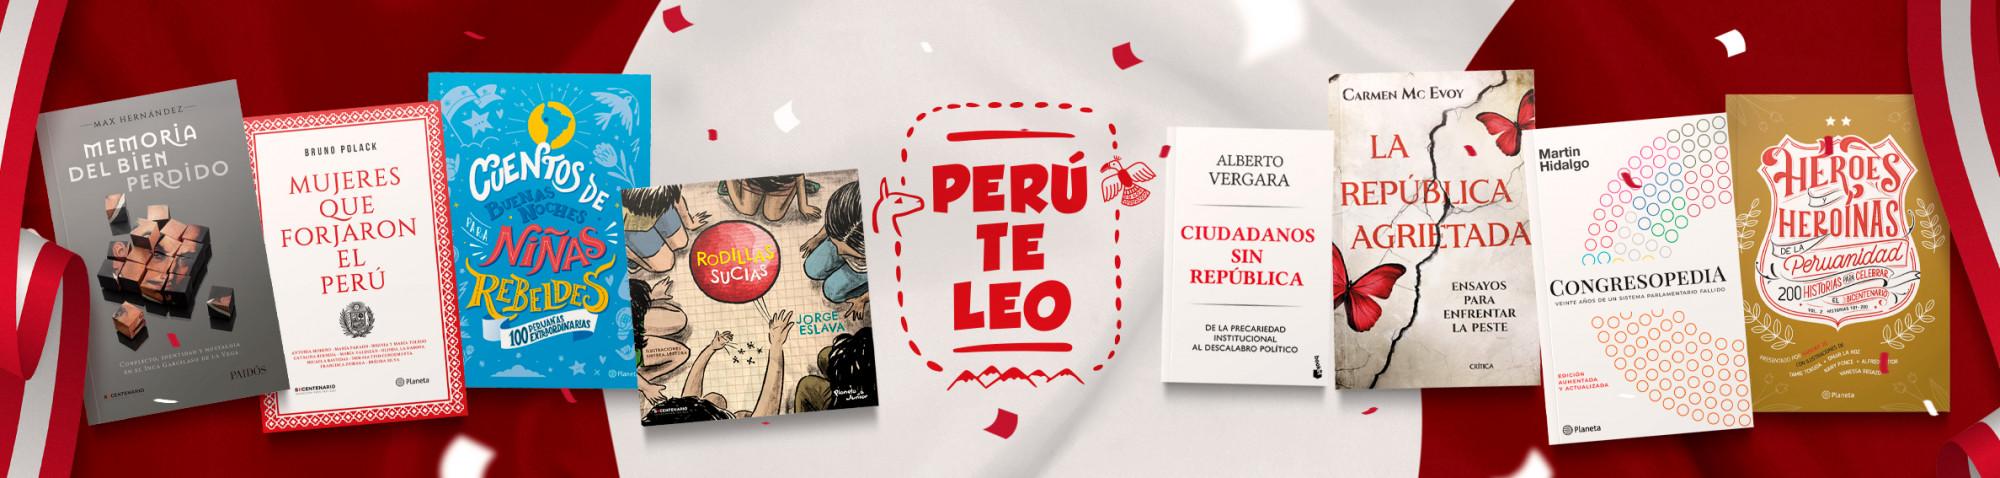 1249_1_WEB---PERU-TE-LEO.jpg